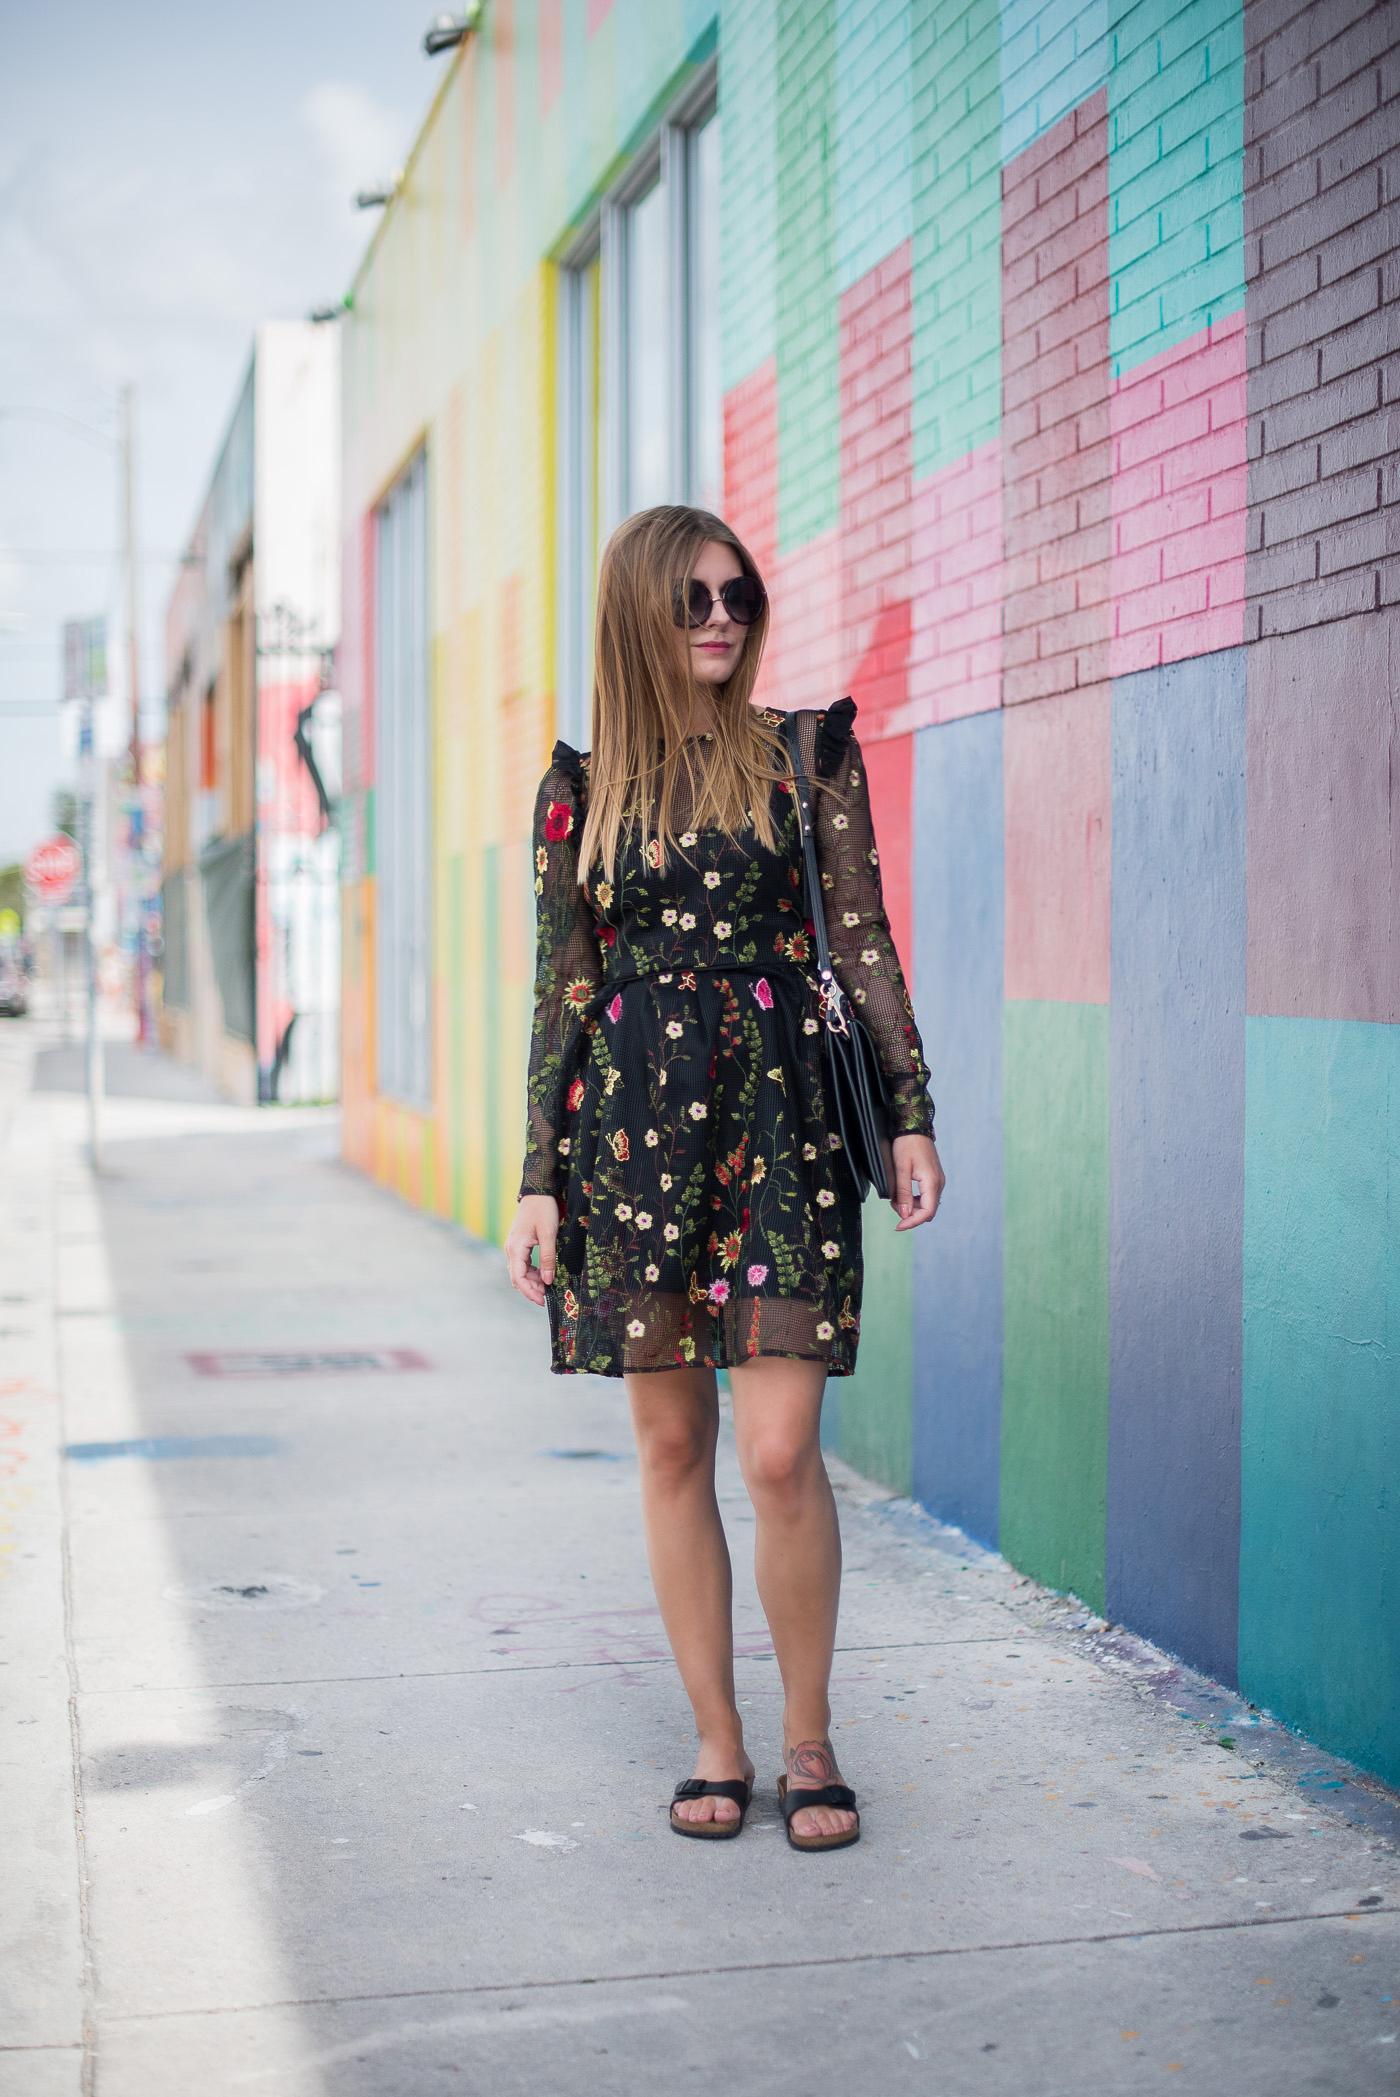 miami_wynwood_walls_flower_print_dress_6